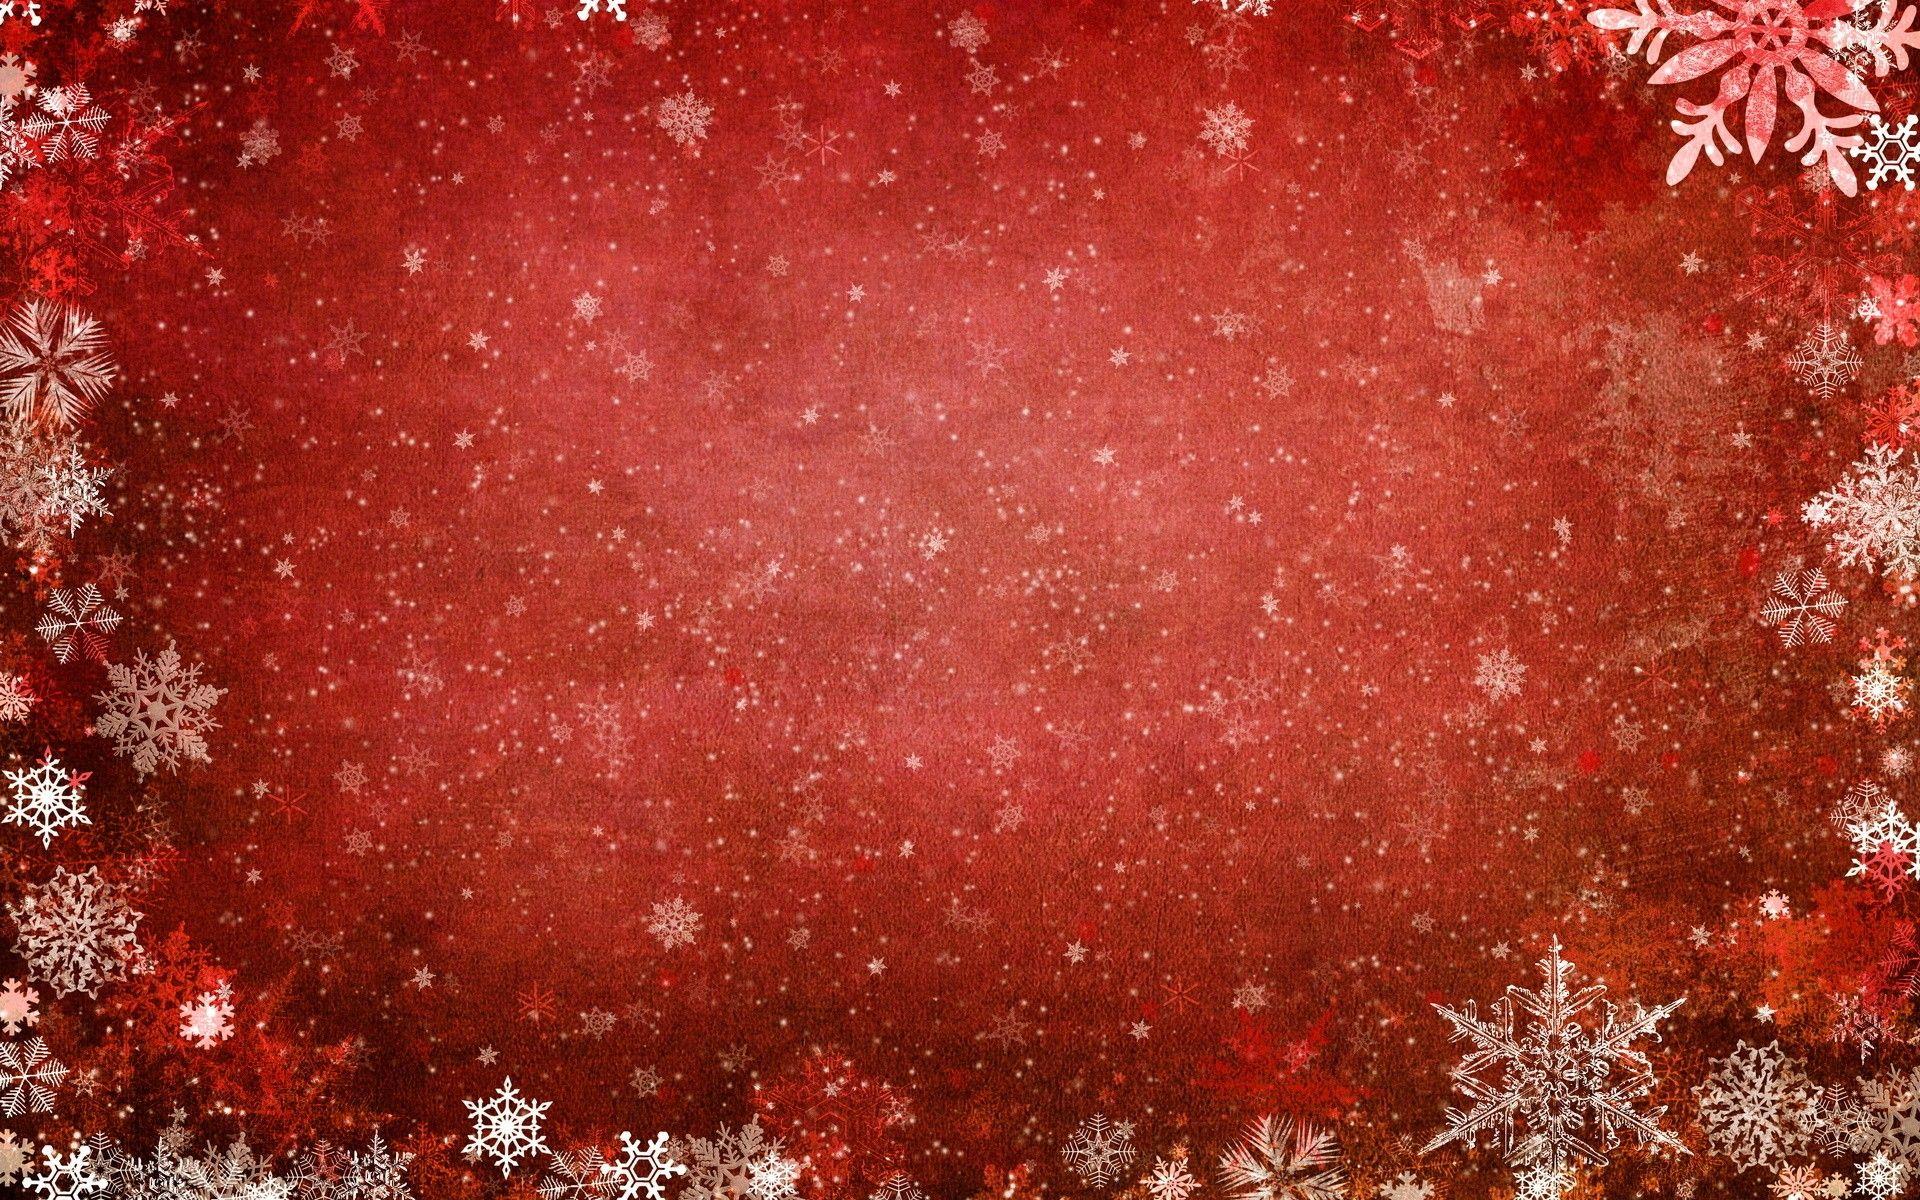 Fondos De Pantalla Navidenos Gratis: Fondos De Navidad Para Niños Para Pantalla Hd 2 HD